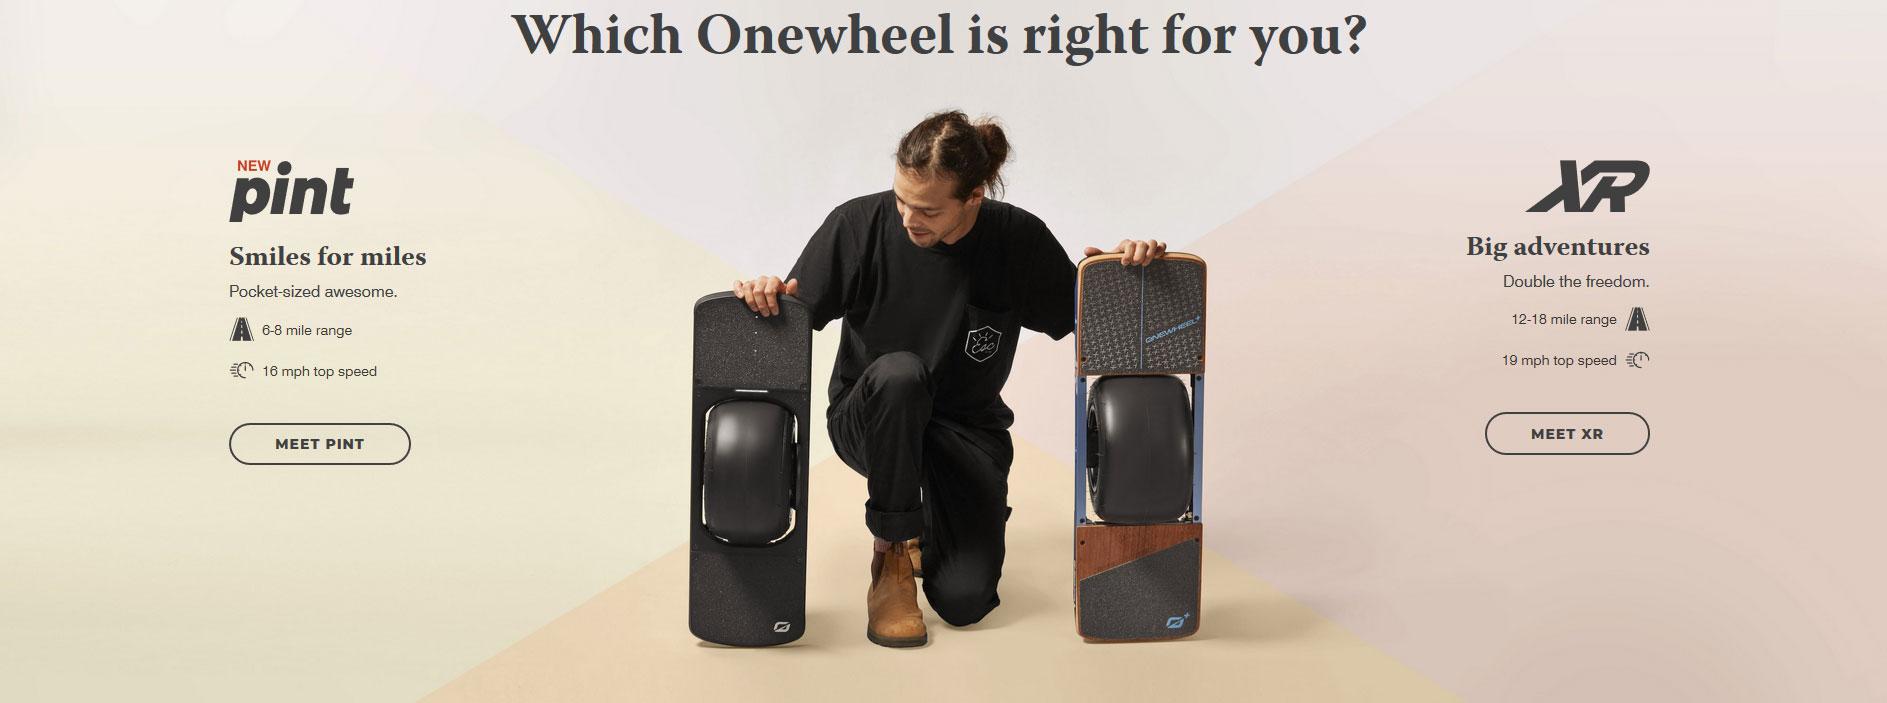 950 USD Onewheel Pint is a smaller version of Onewheel XR